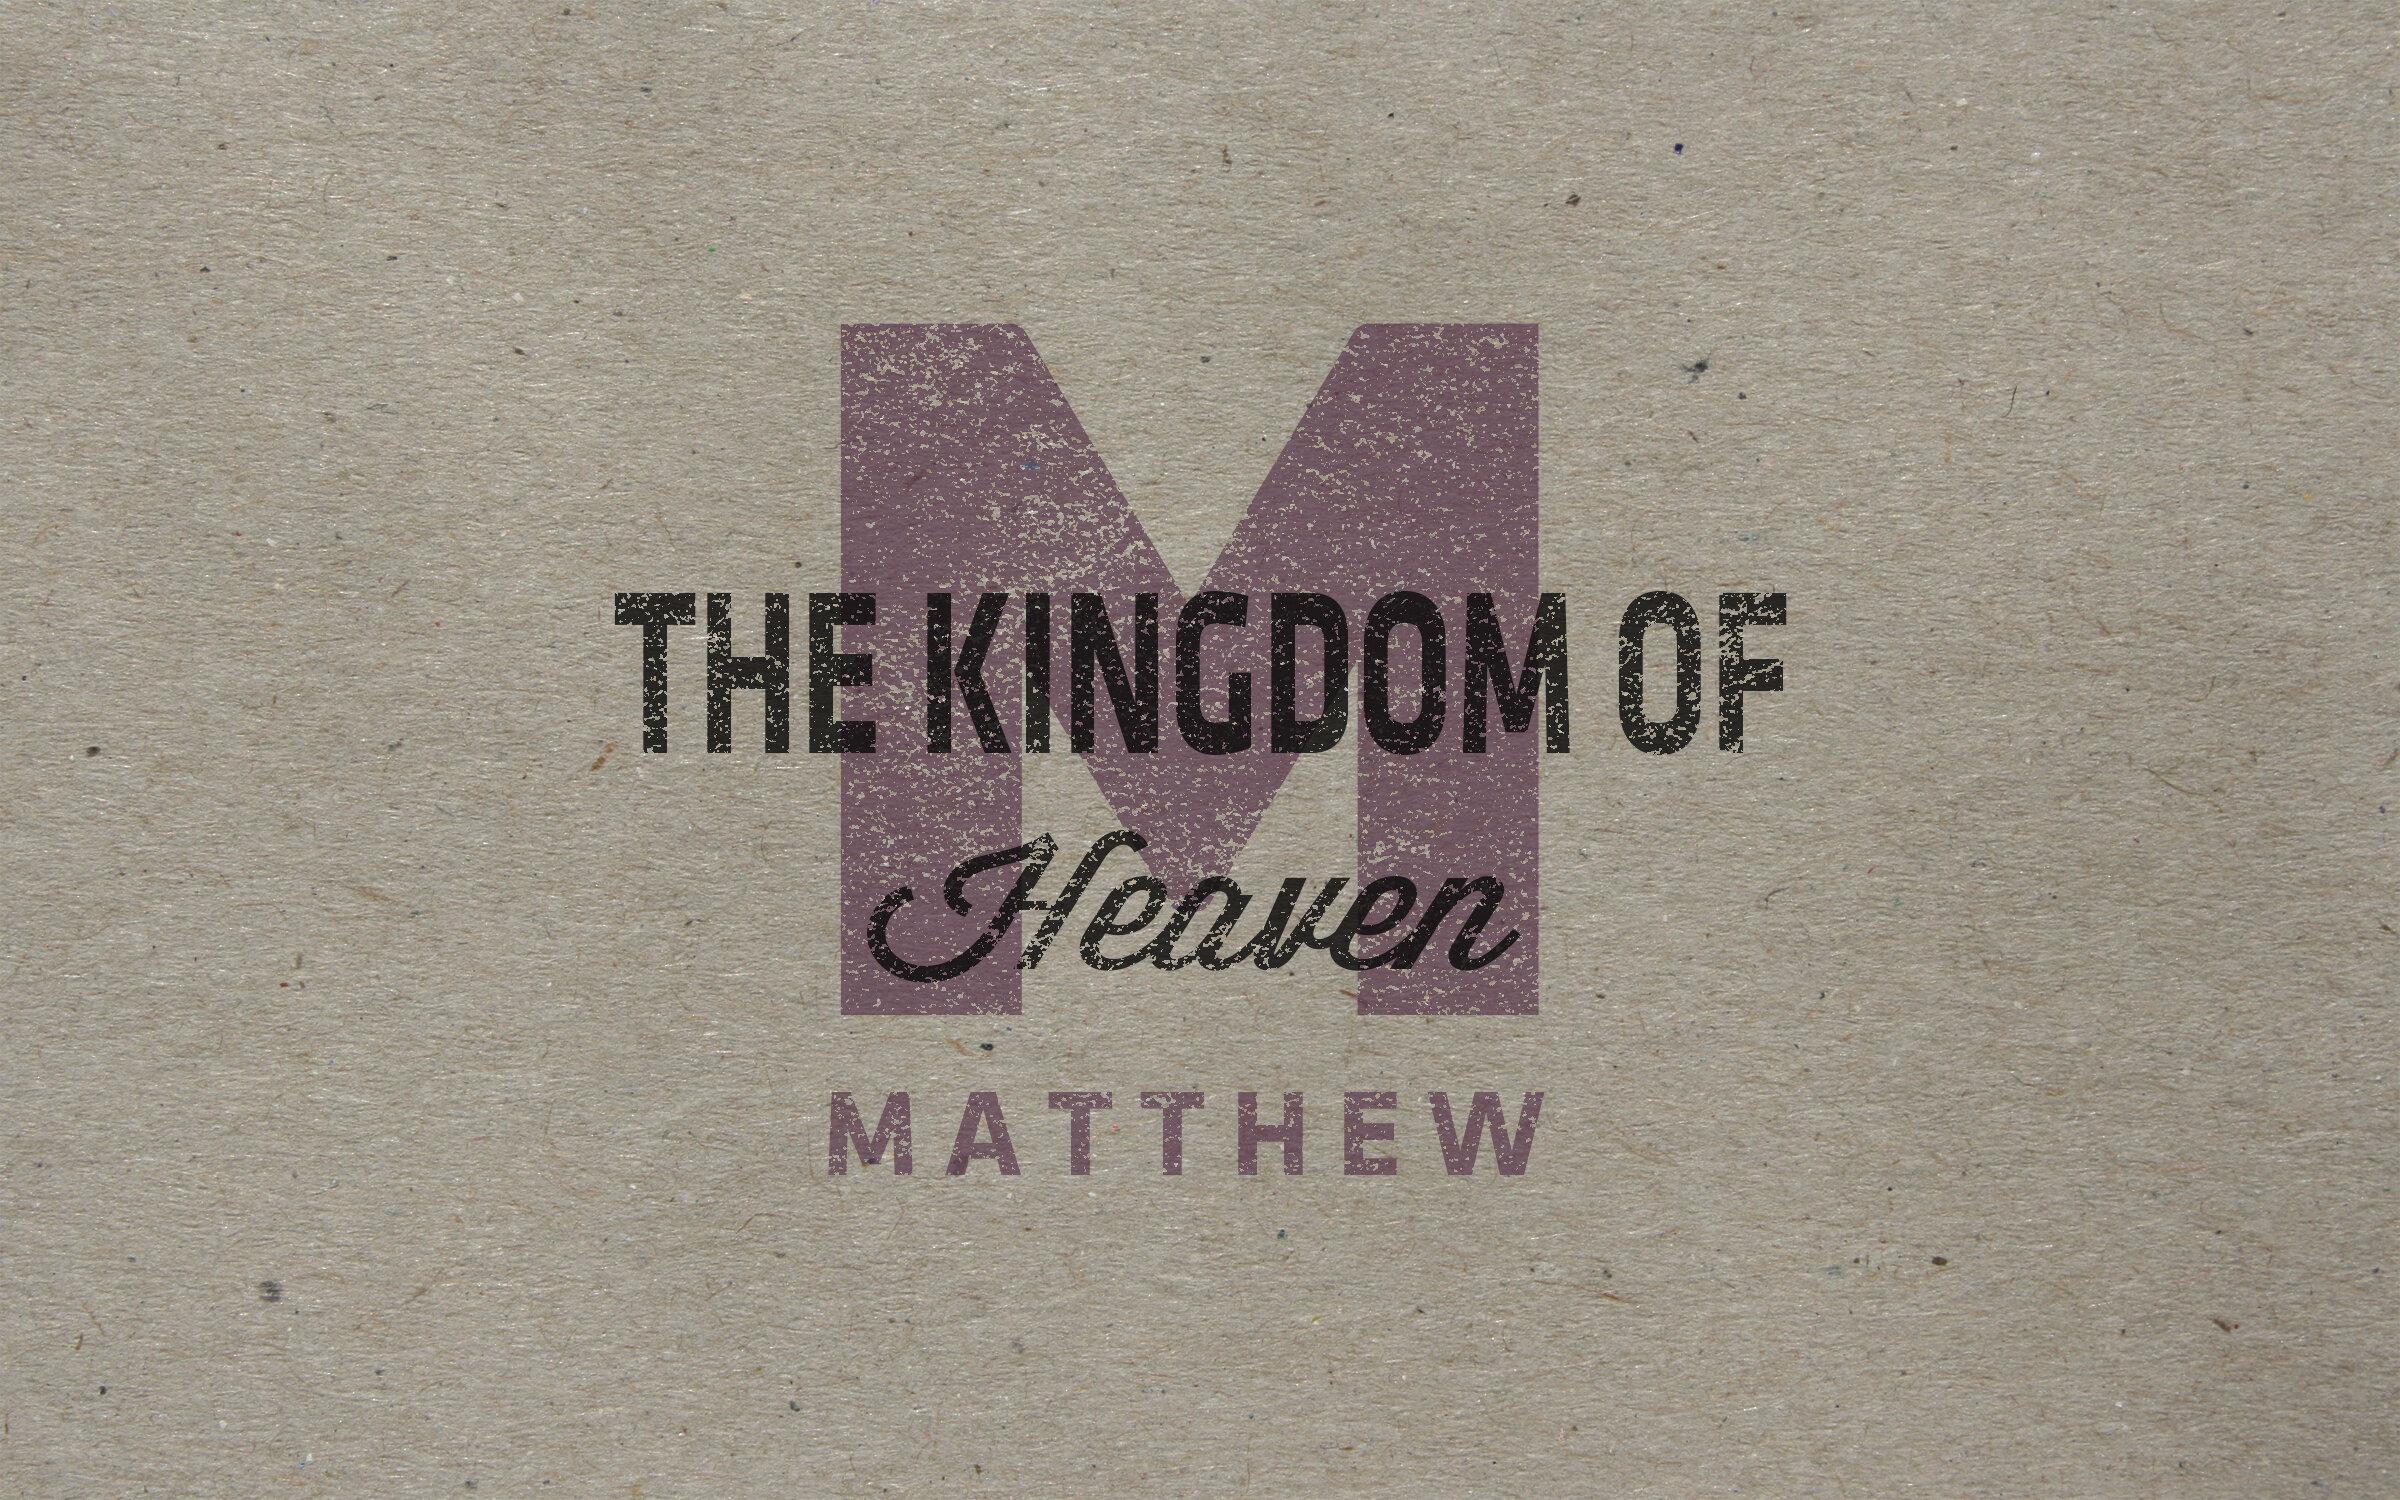 Matthew_image.jpg